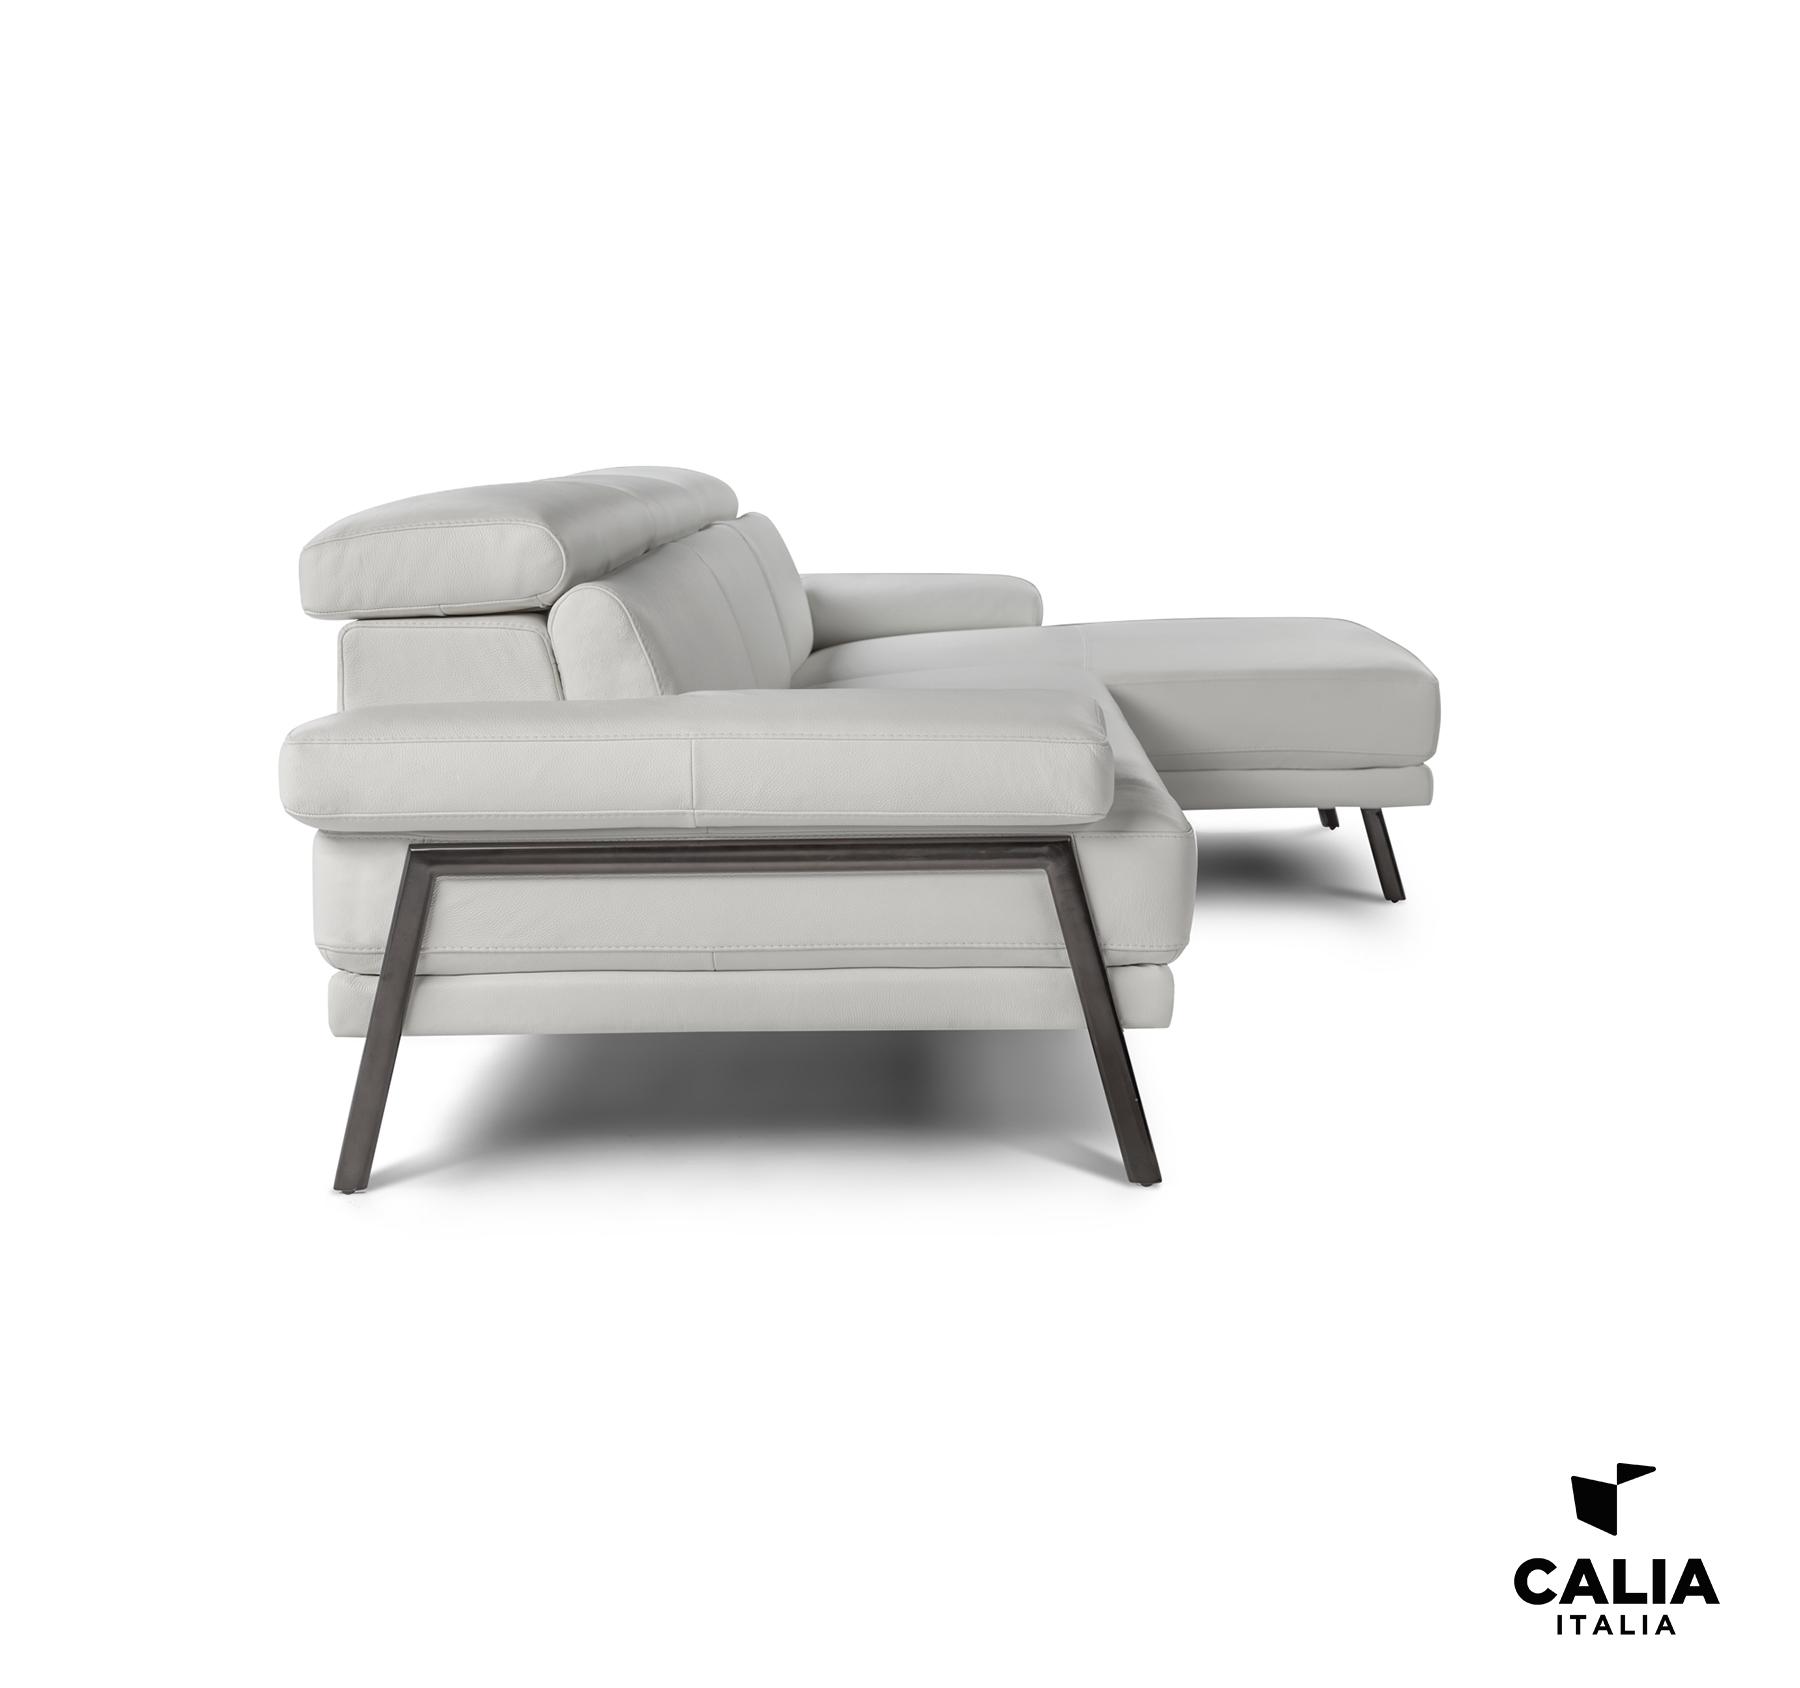 Caliaitalia - Edo